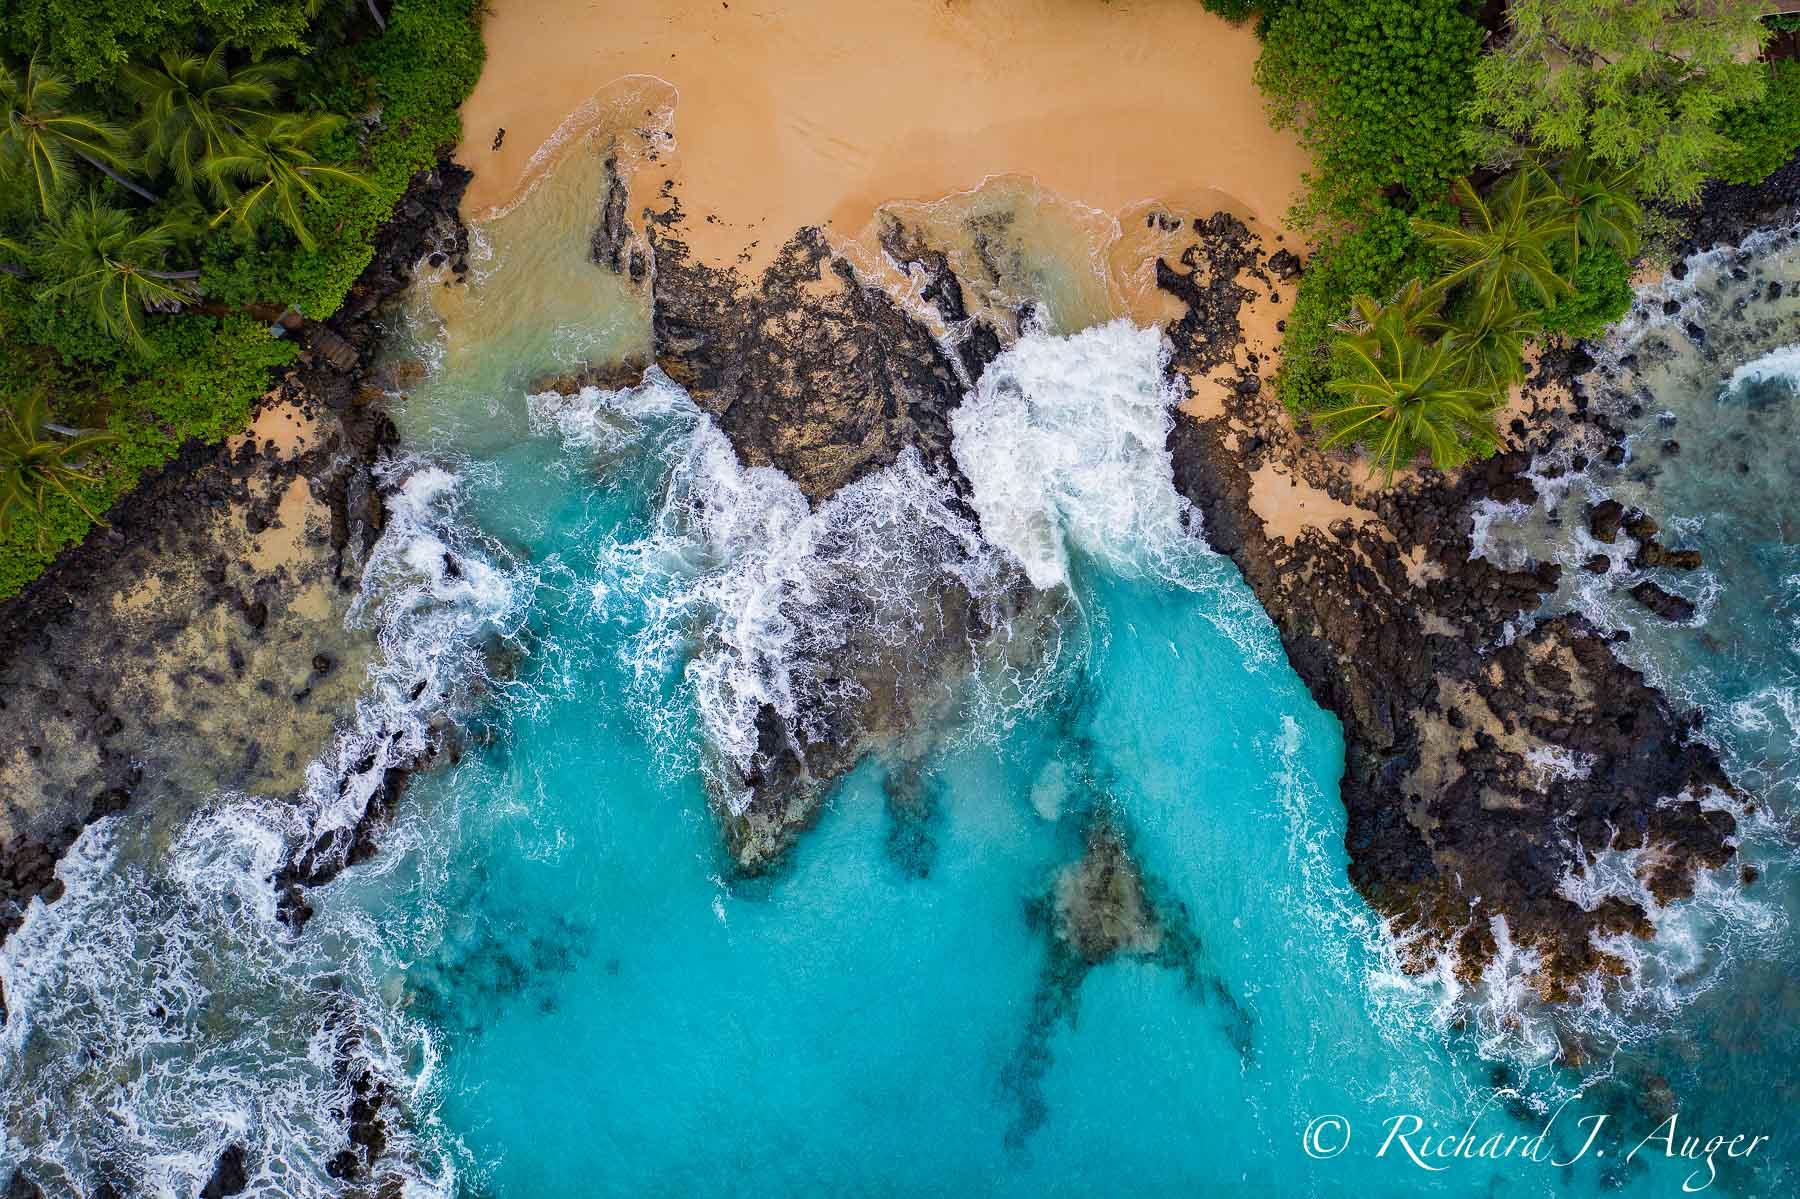 Maui, Makena Cove, Aerial, Drone, Photograph, Photographer, Blues, Ocean, Morning, Calm